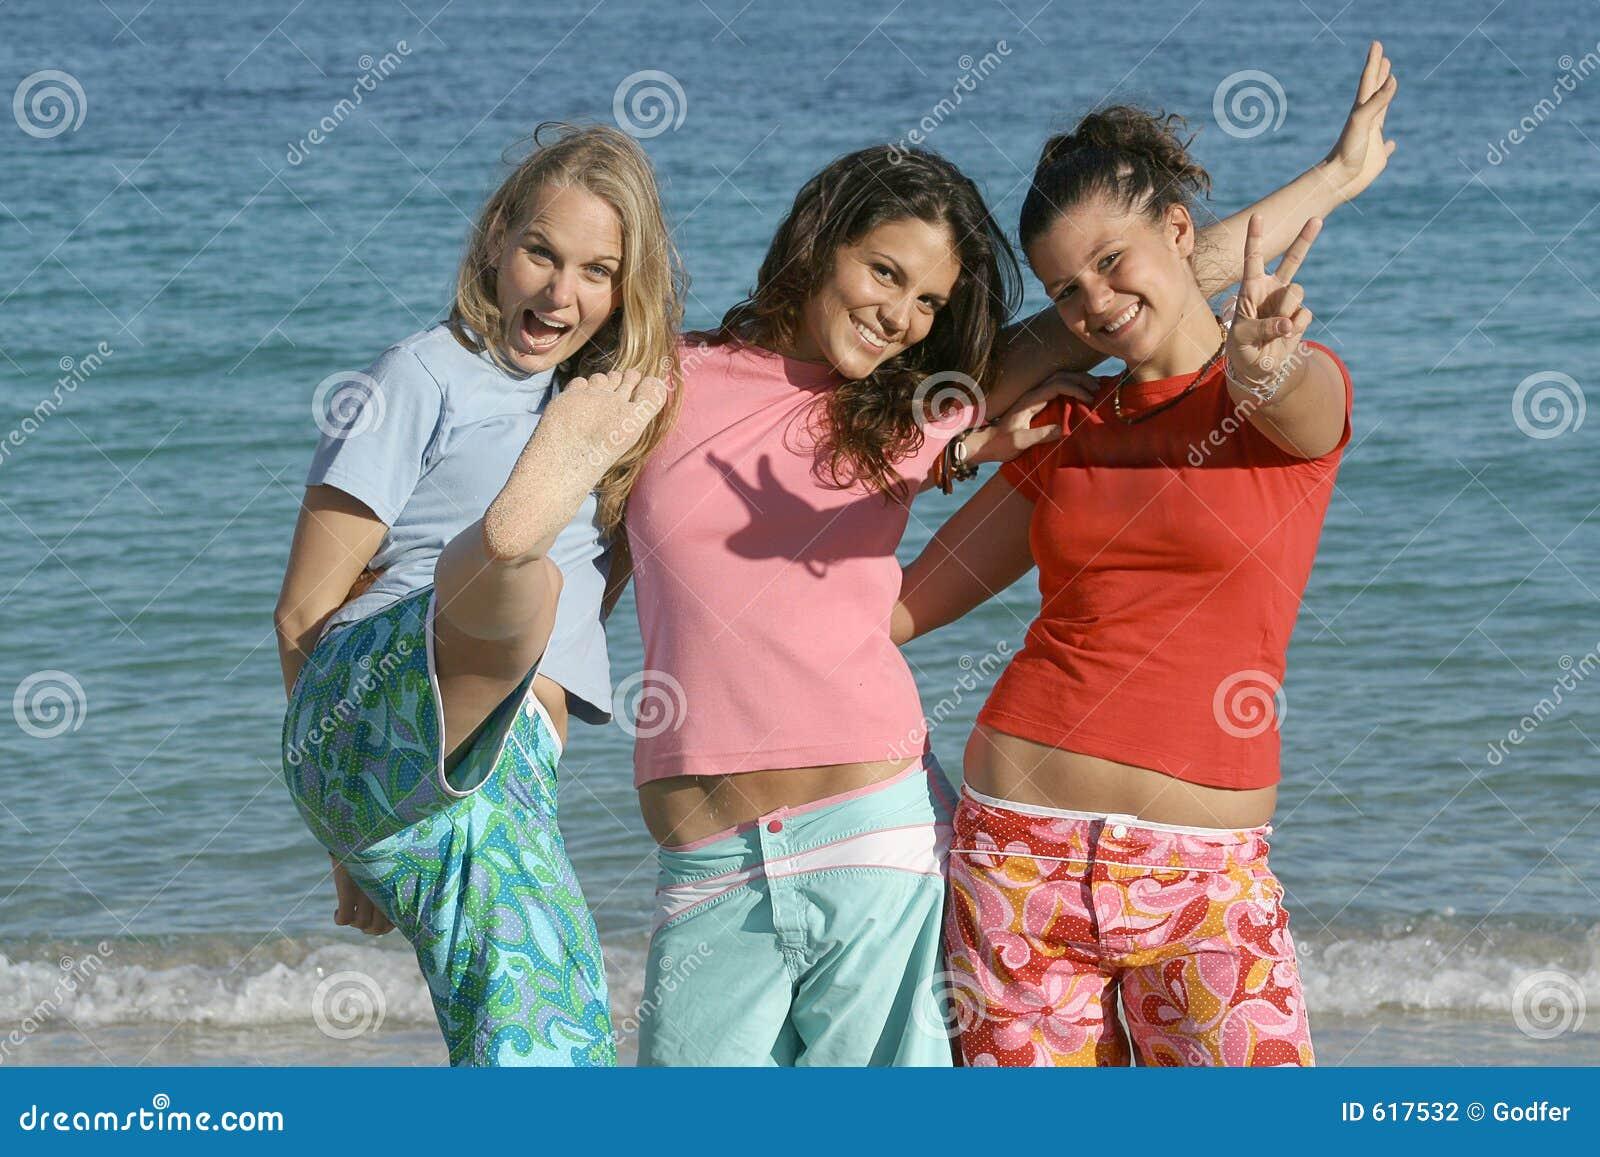 beach summer holiday group